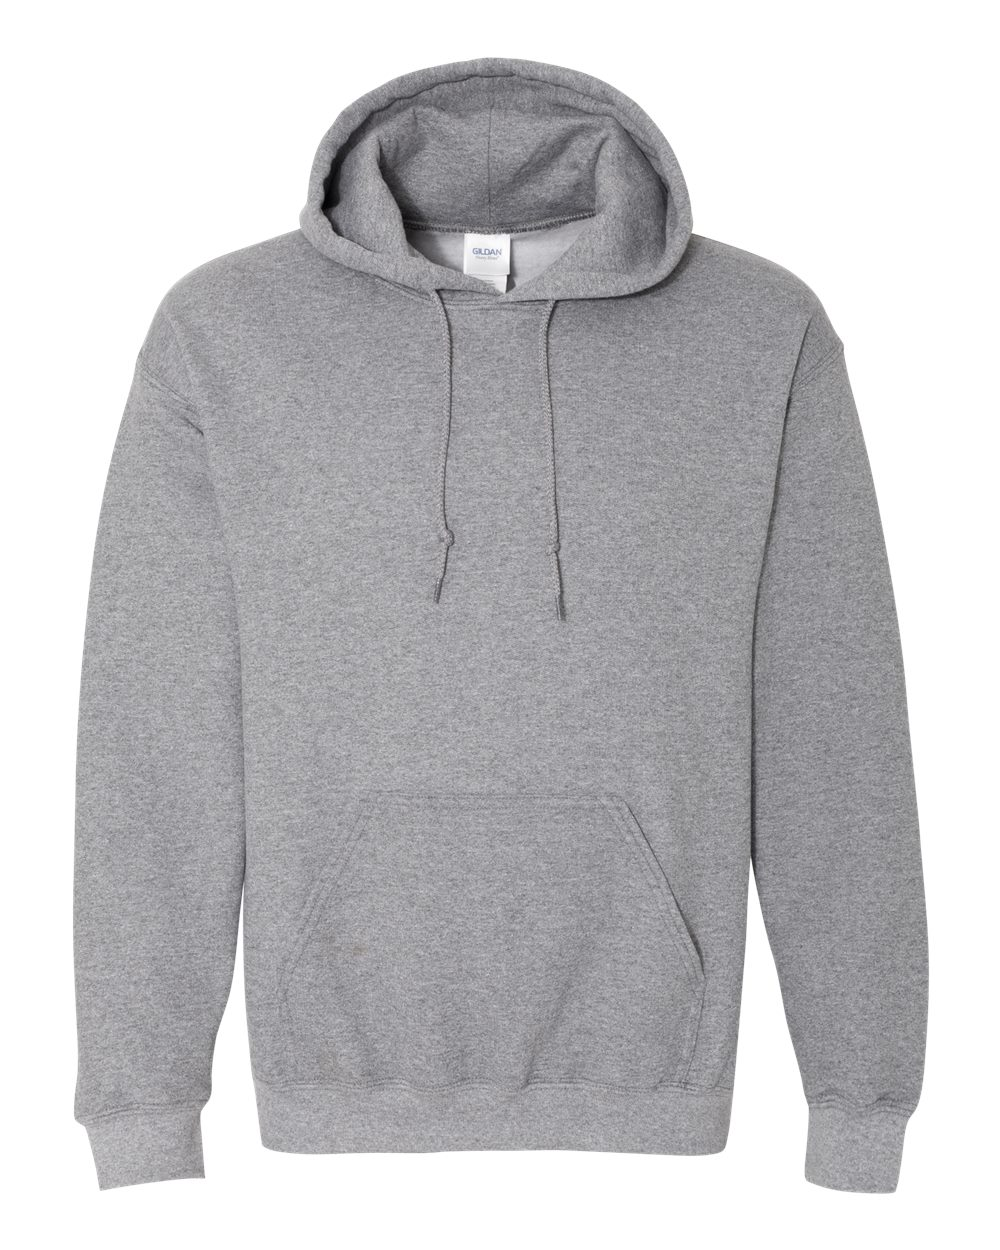 Gildan-Mens-Blank-Hoodie-Heavy-Blend-Hooded-Sweatshirt-18500-up-to-5XL thumbnail 18